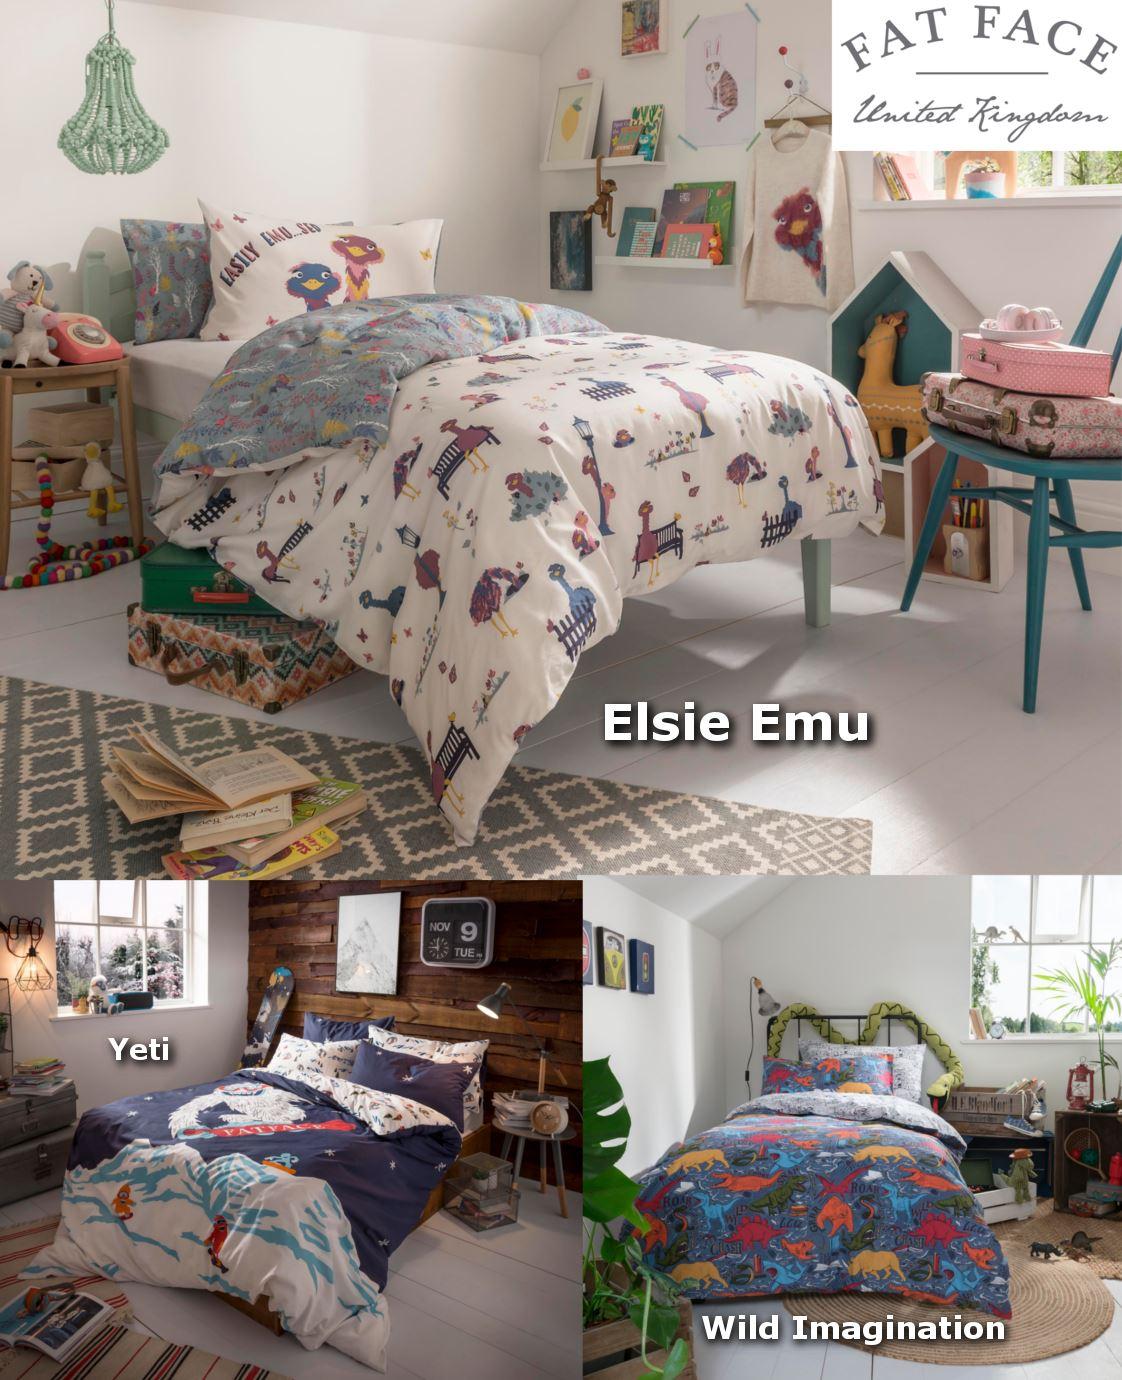 Wild Imagination Childrens Duvet Cover Set 100/% Cotton Fat Face Kids Bedding